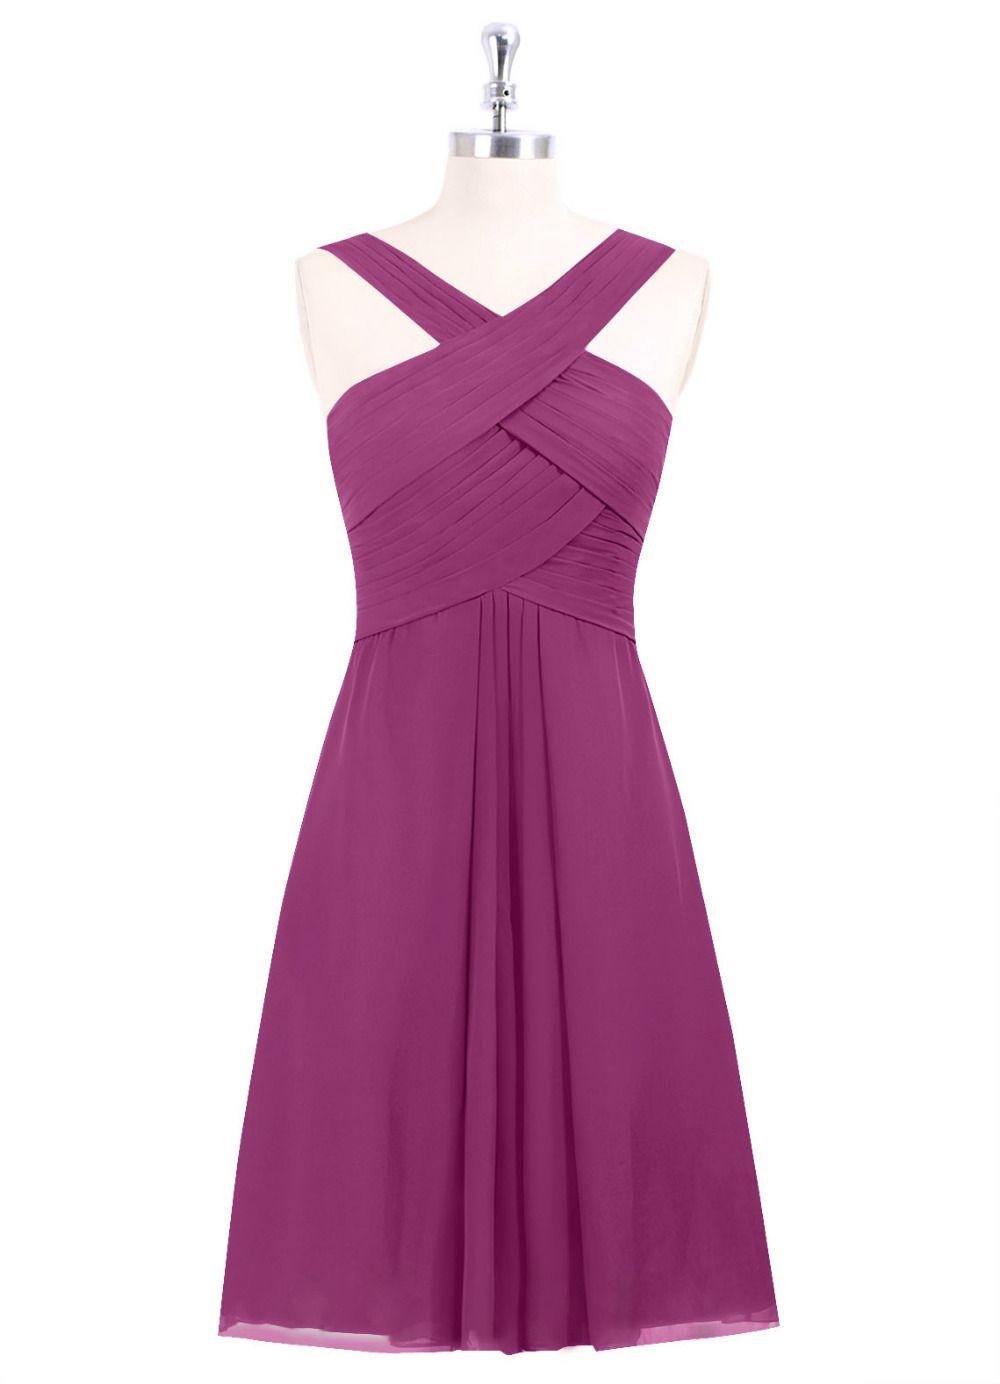 New Arrival Knee Length Short Bridesmaid Dress Ruched Chiffon ...